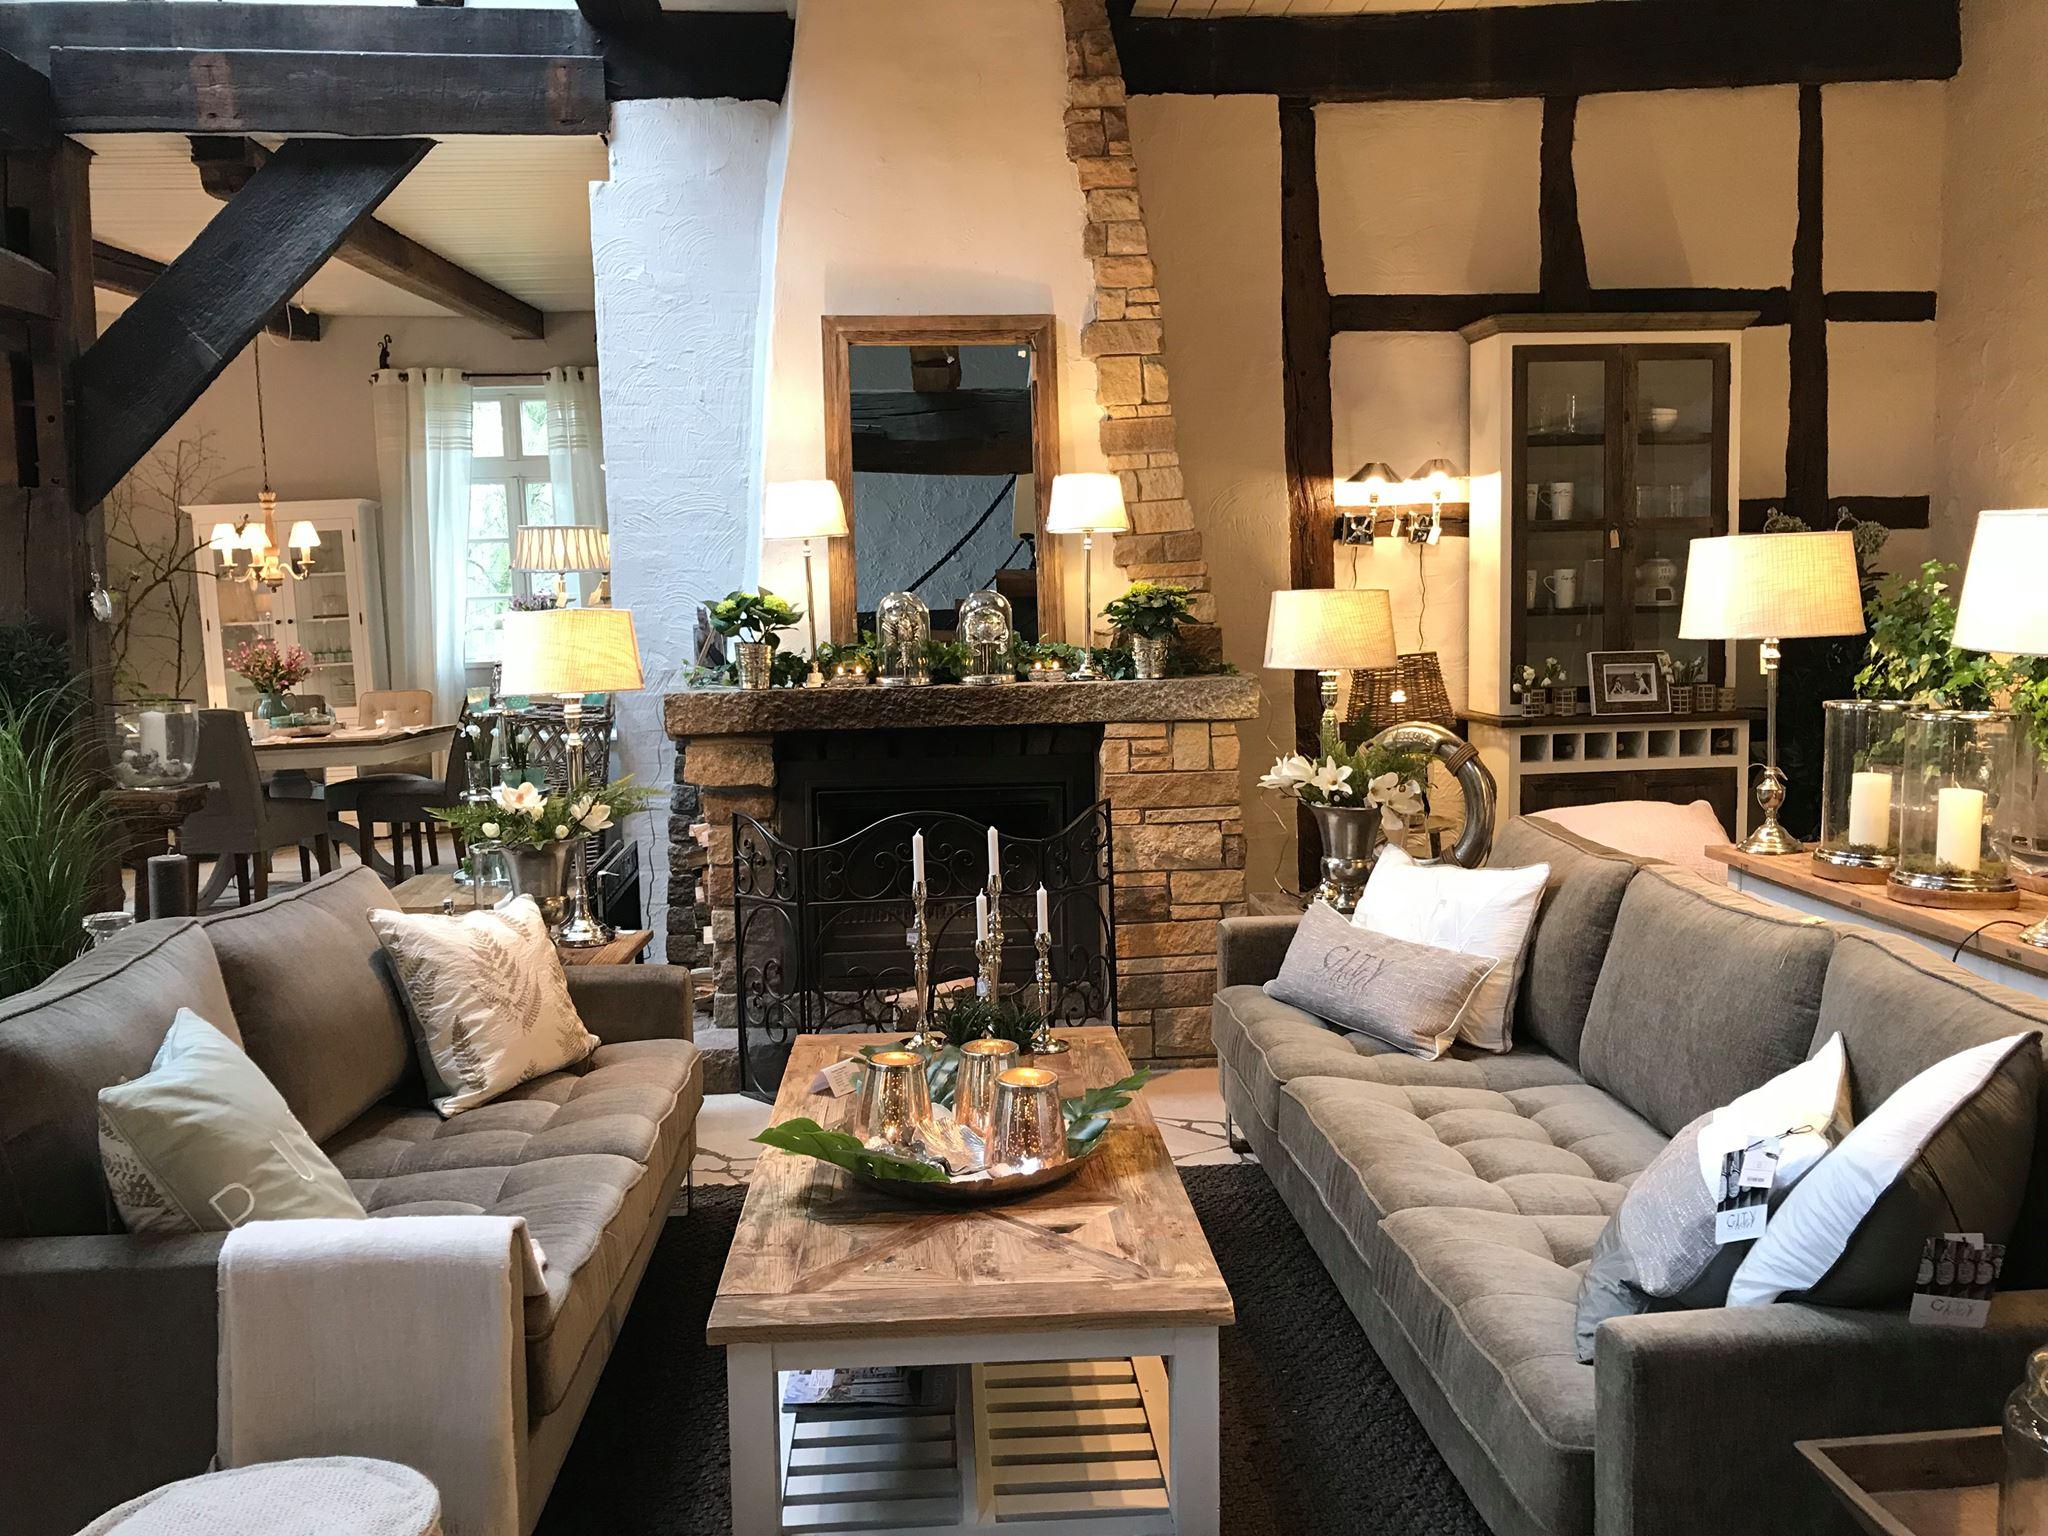 Lampen Riviera Maison : Home page